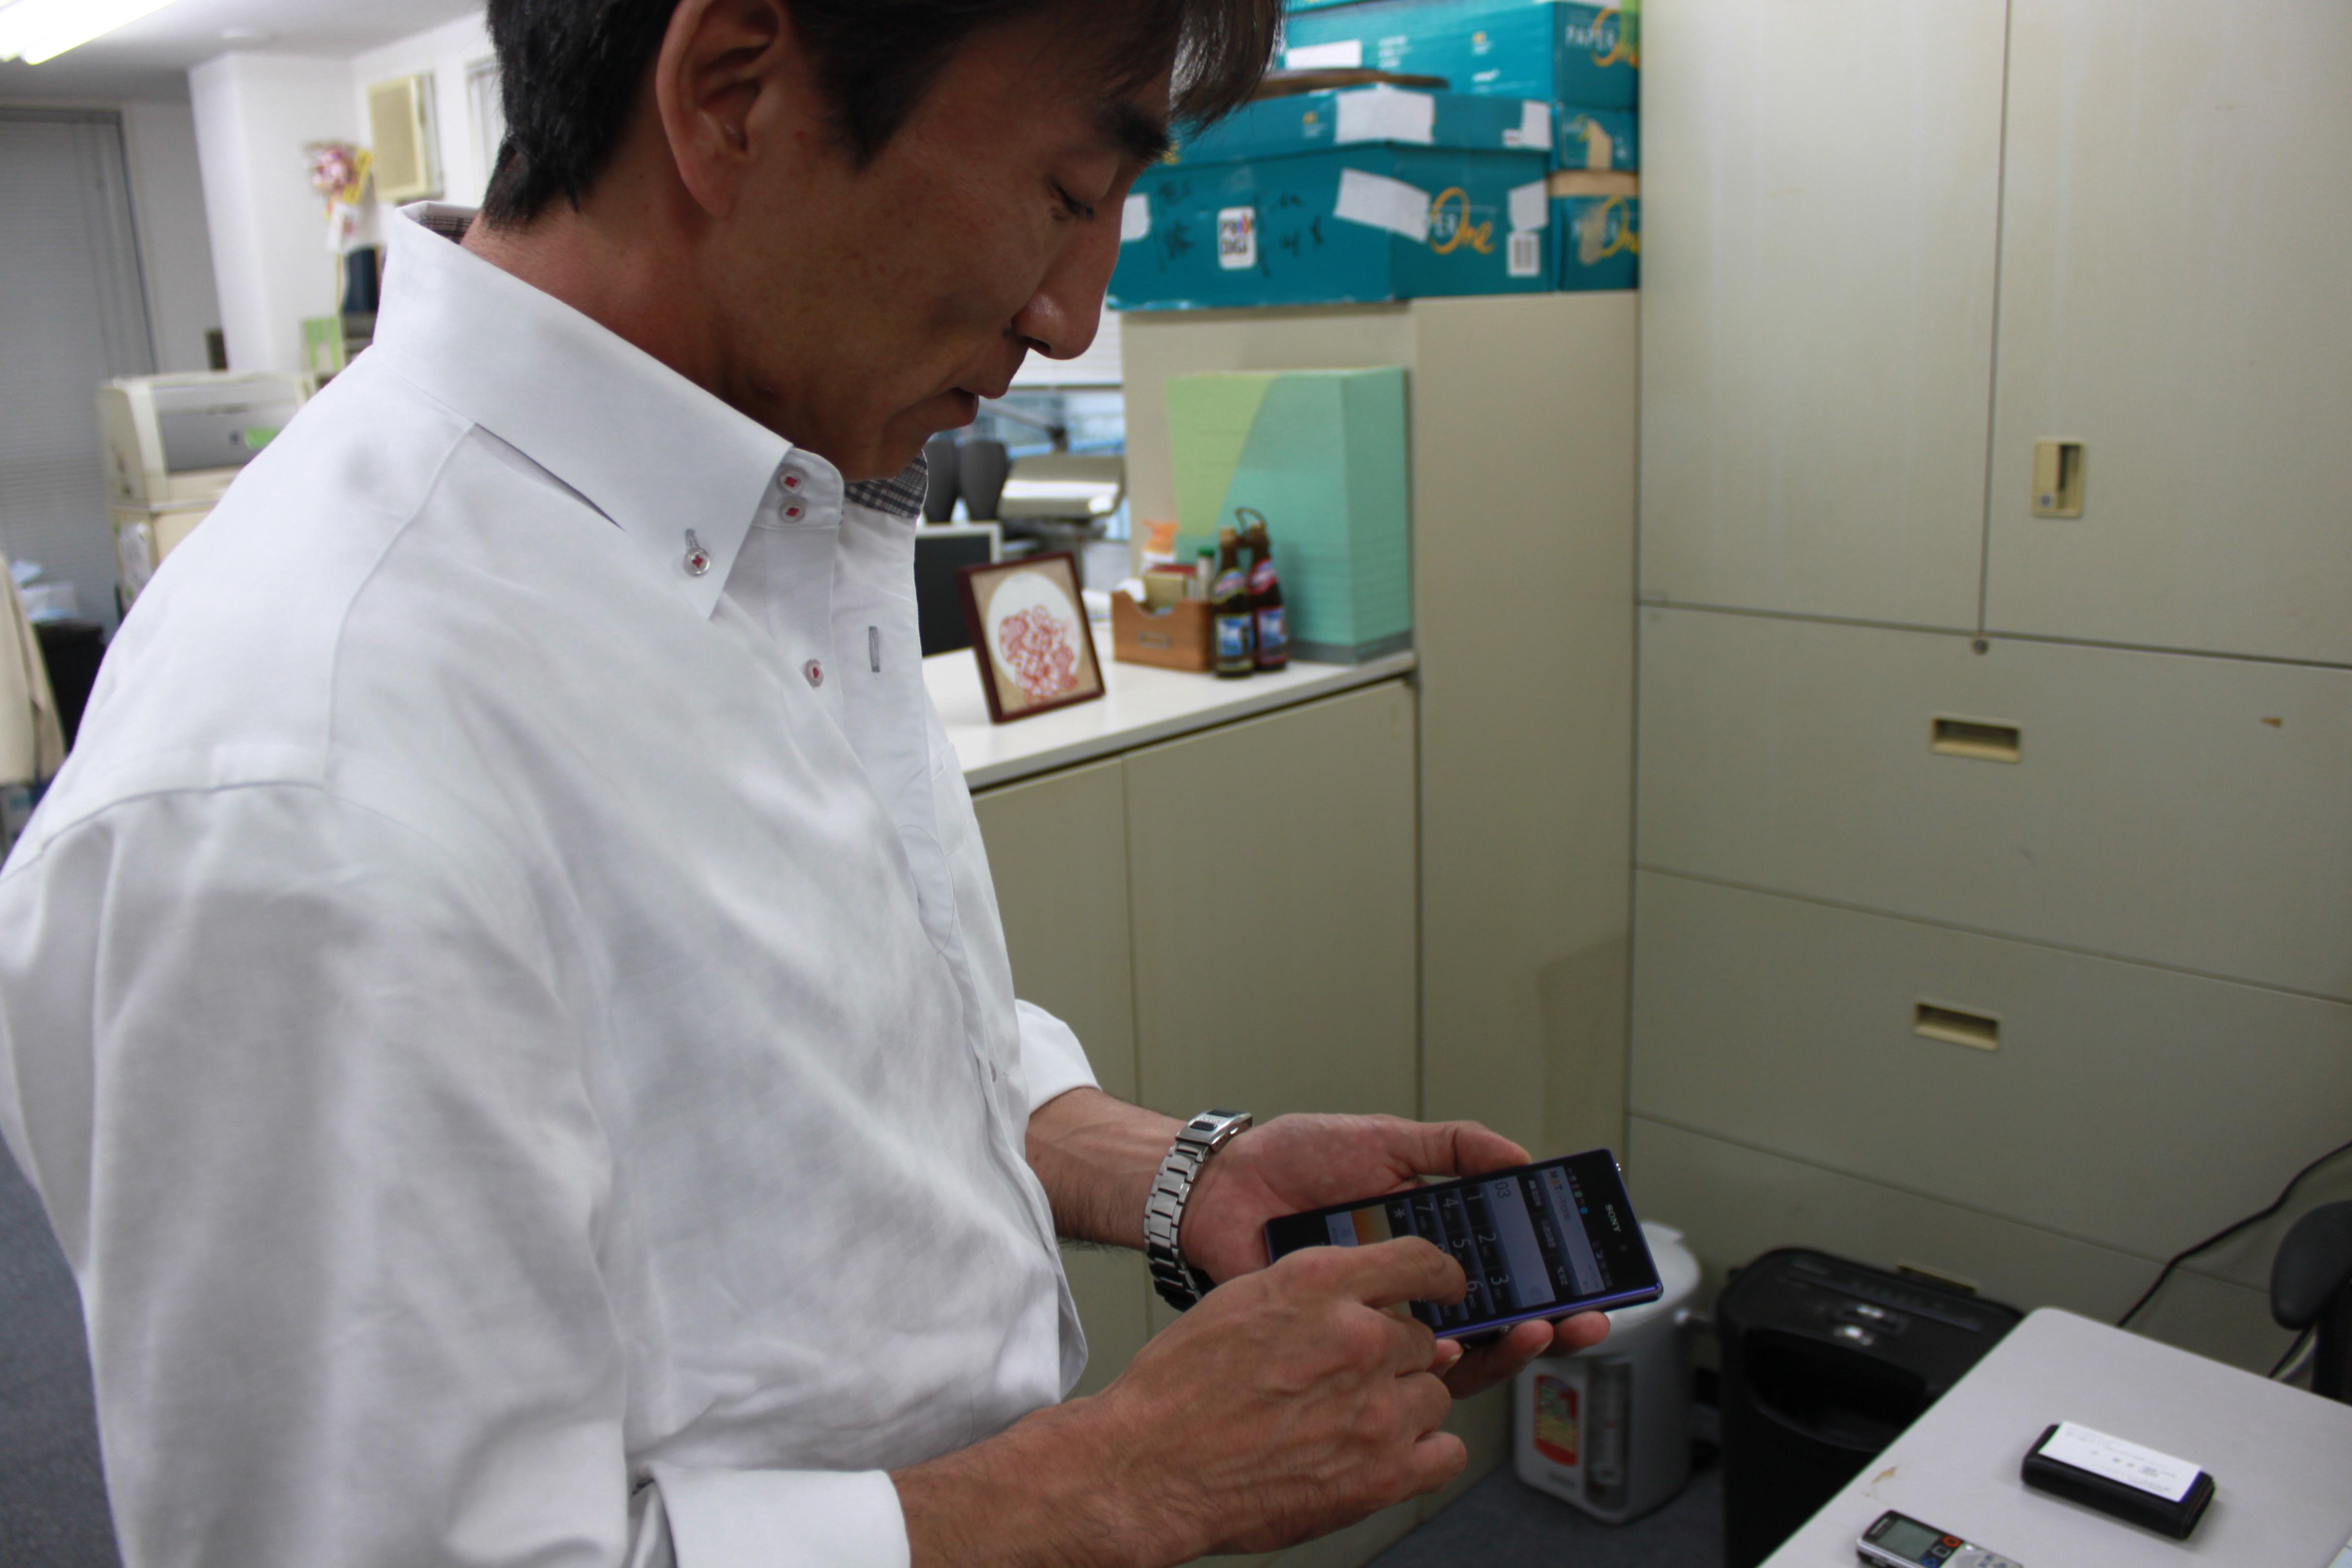 MOT/PBX導入頂いた株式会社ベストデザインの代表取締役 社長 黒瀬 匠 様